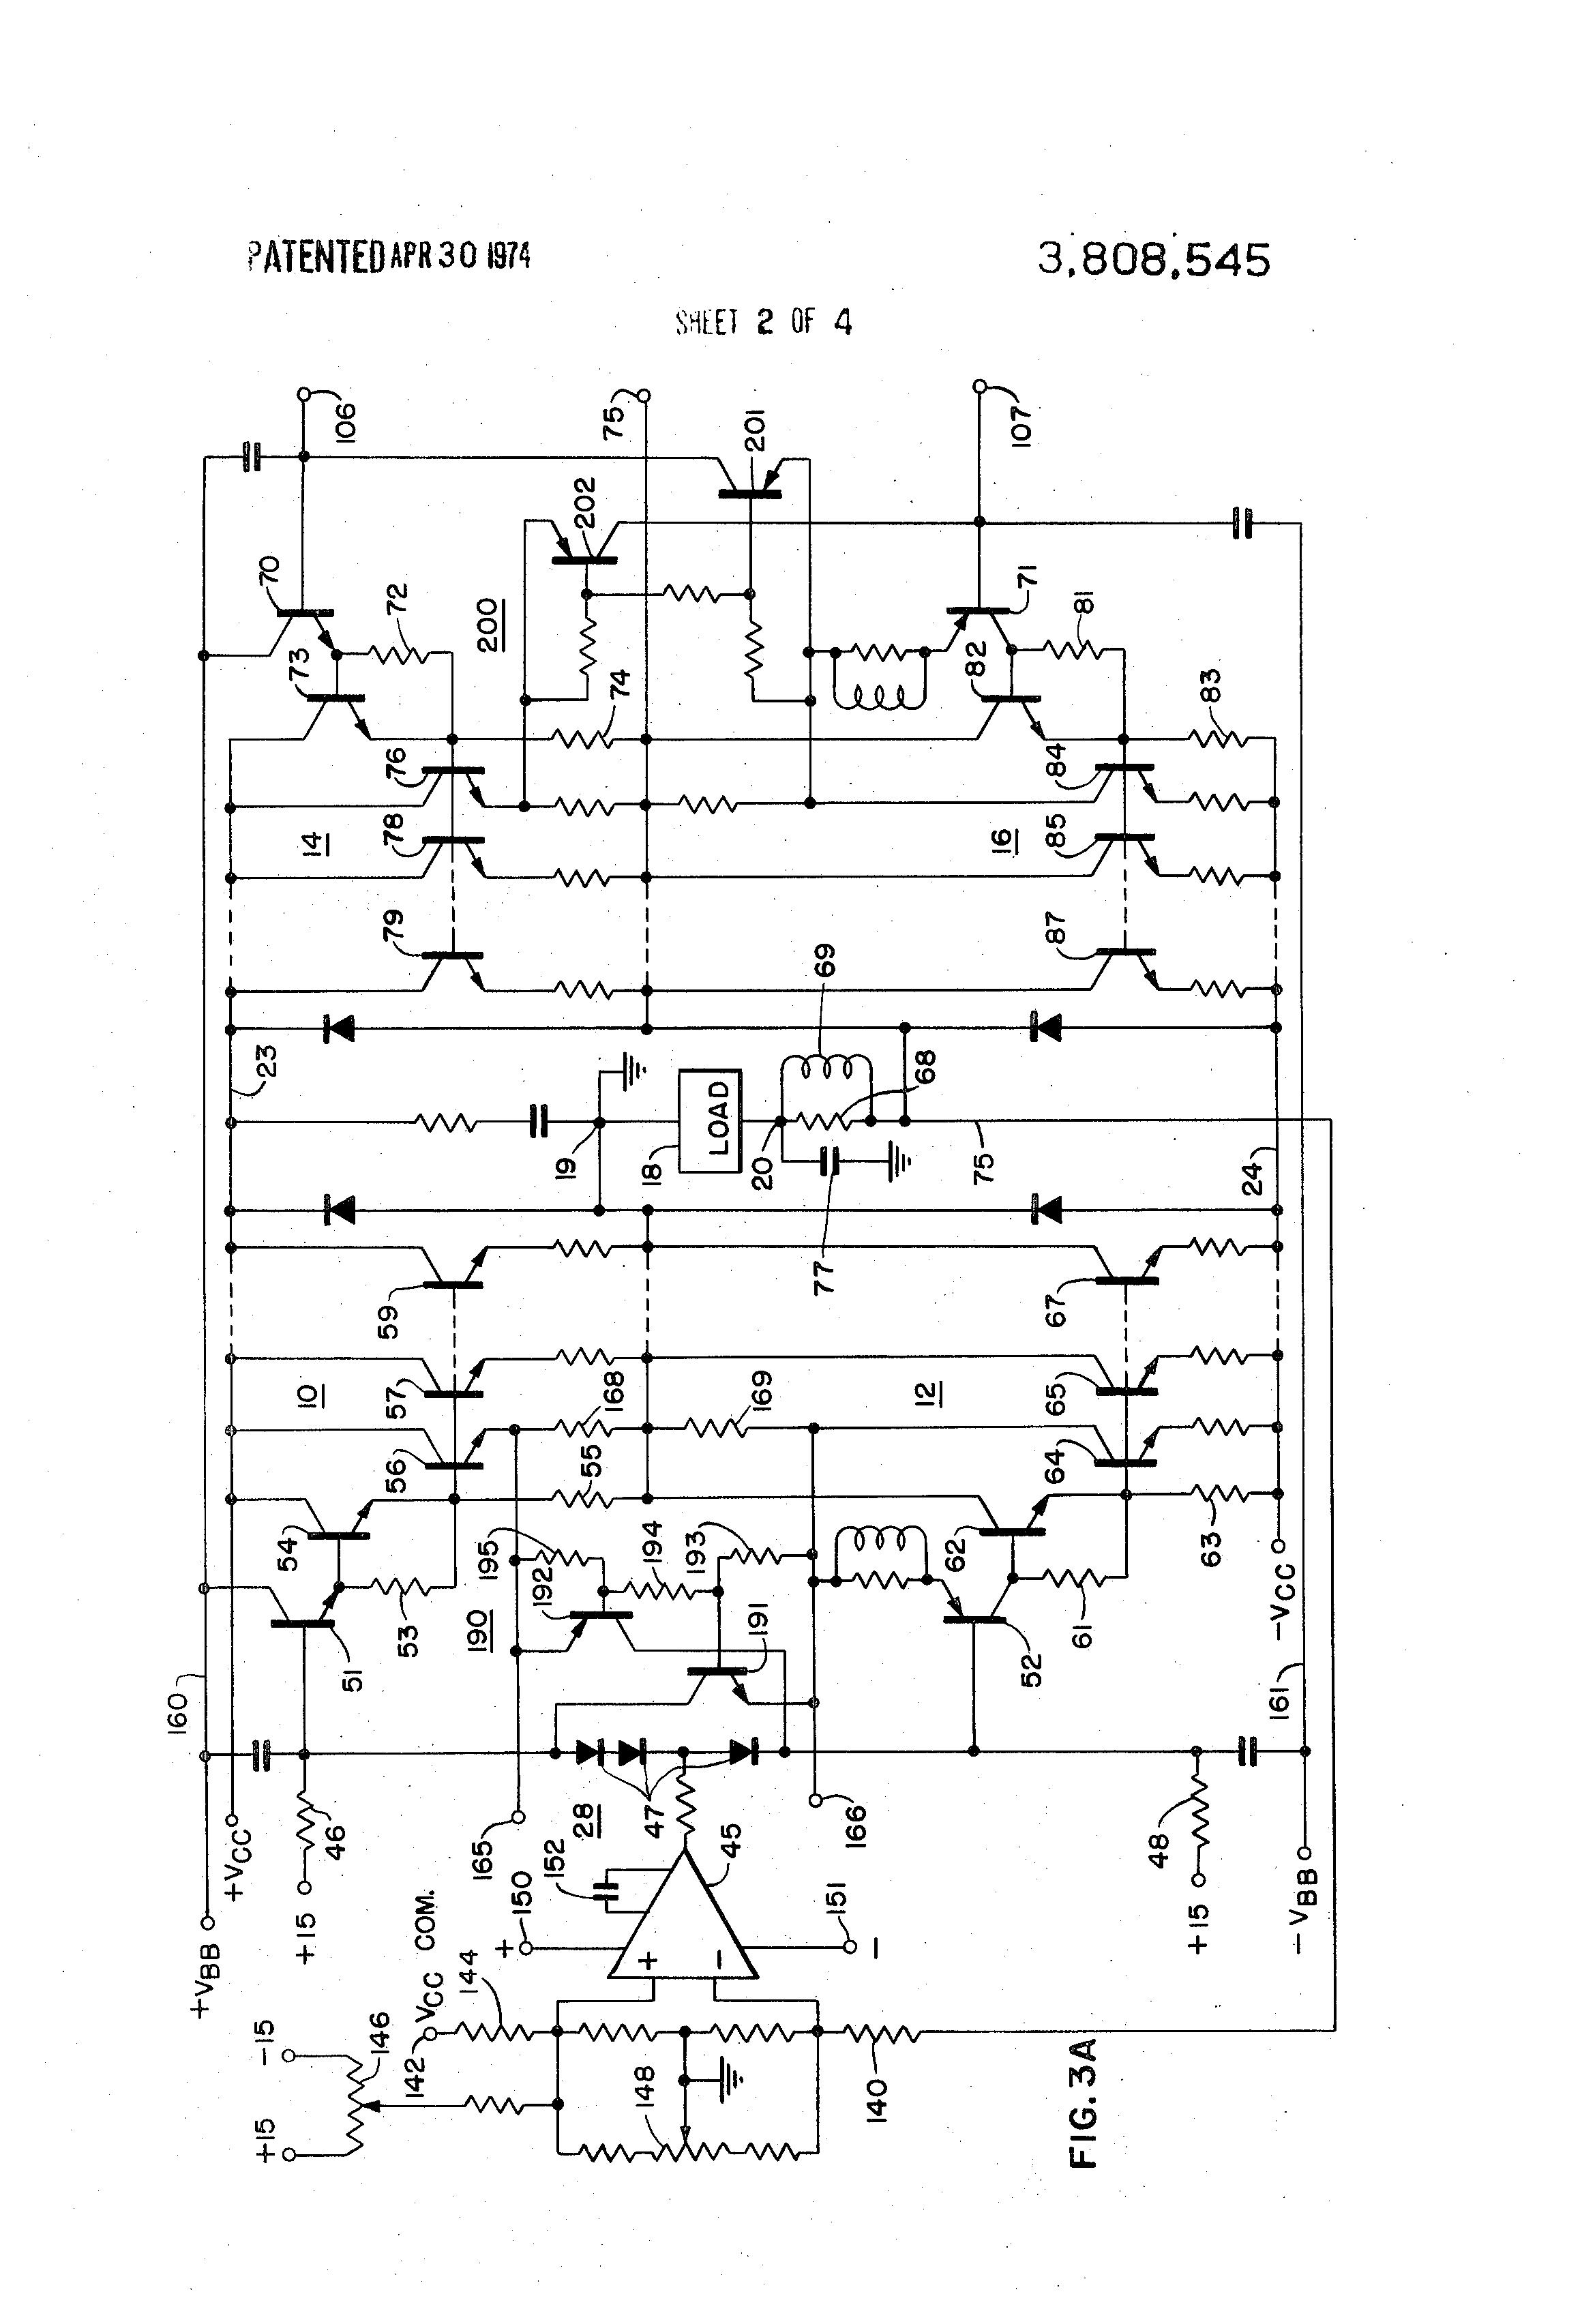 2n3773 Amplifier Circuit Diagram News Of New Car 2019 2020 Class A Audio Patent Us3808545 High Power Bridge Google